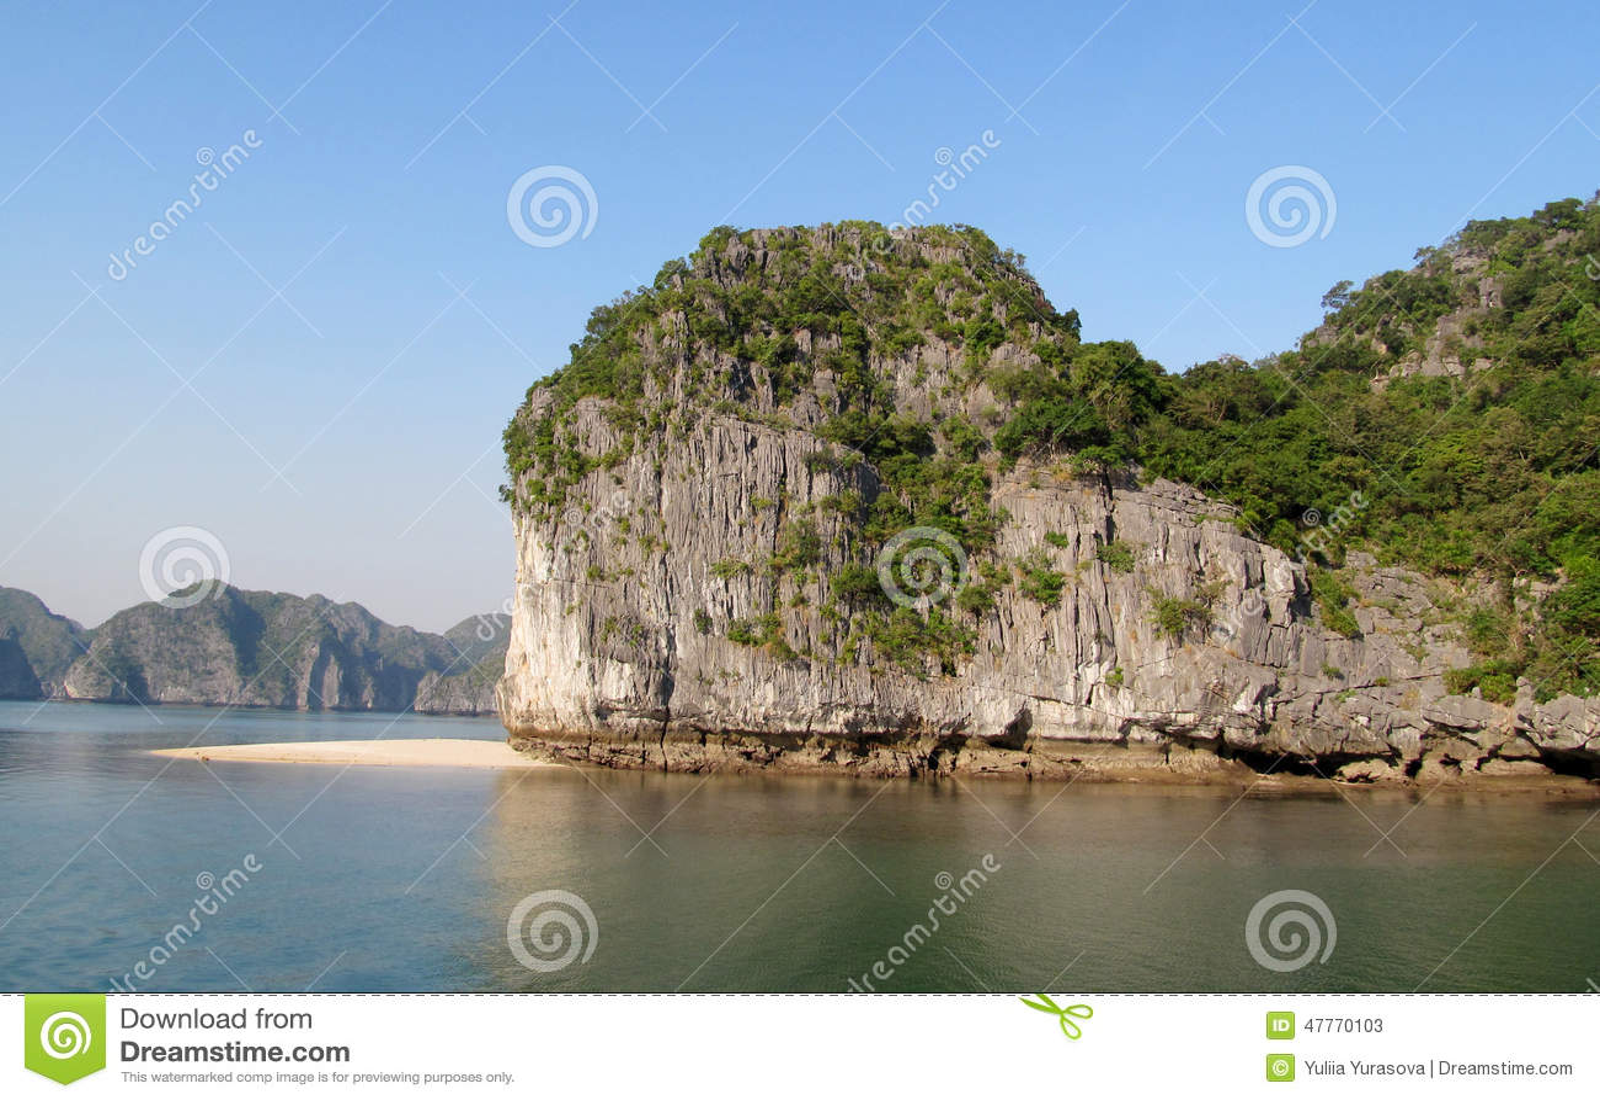 Rocks and islands of Ha Long Bay near Cat Ba island, Vietnam.